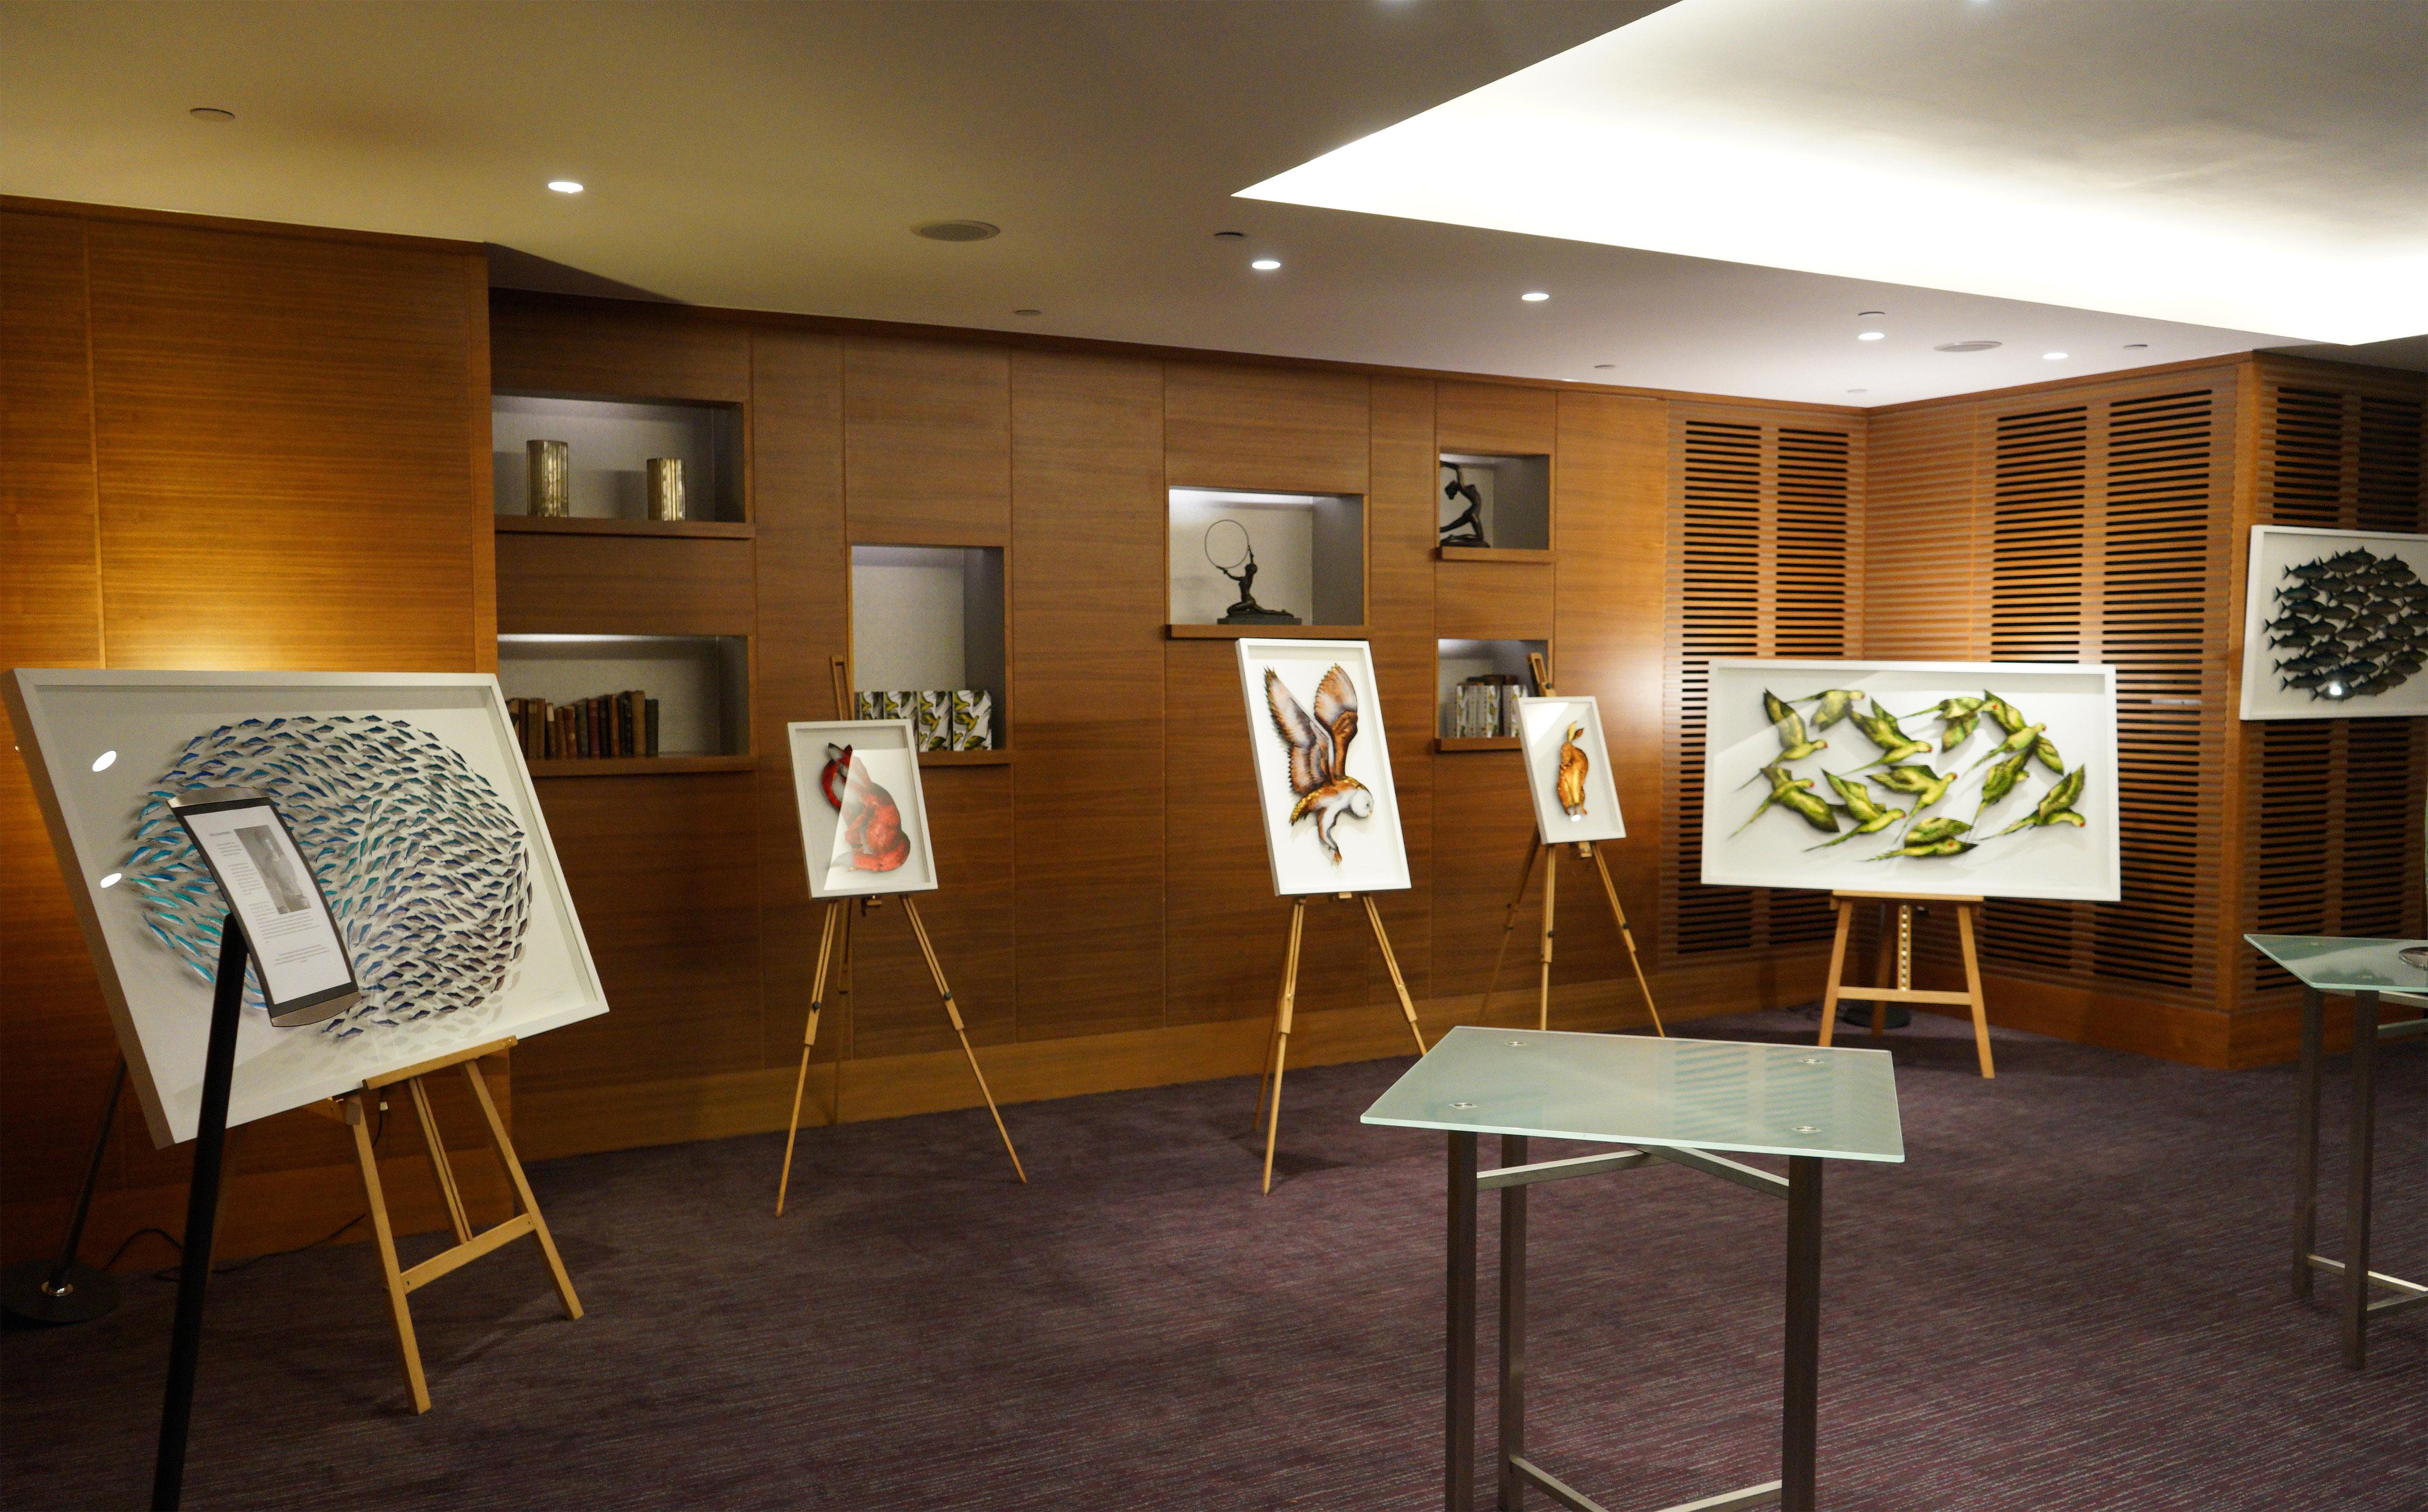 T5 Gallery Sofitel Event